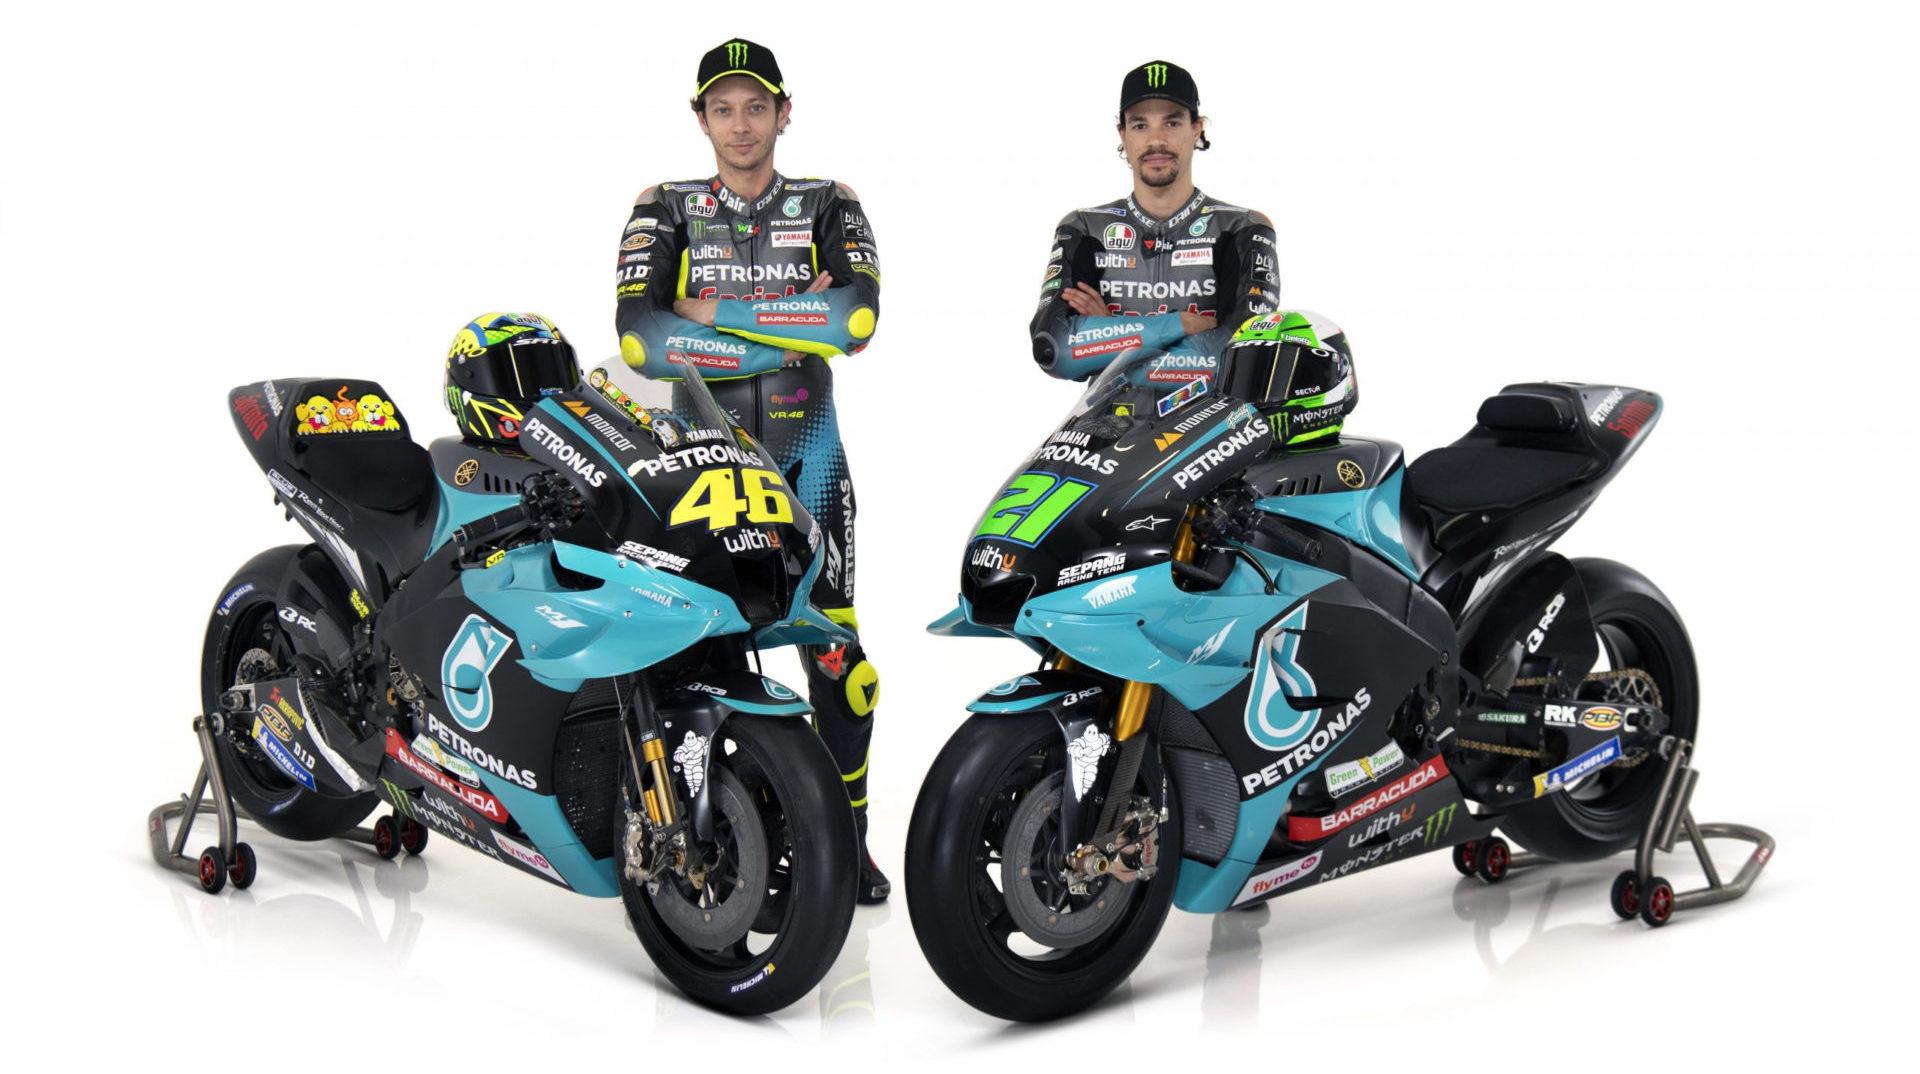 Valentino Rossi (left) with his new PETRONAS Yamaha Sepang Racing Team teammate Franco Morbidelli (right). Photo courtesy PETRONAS Yamaha SRT.